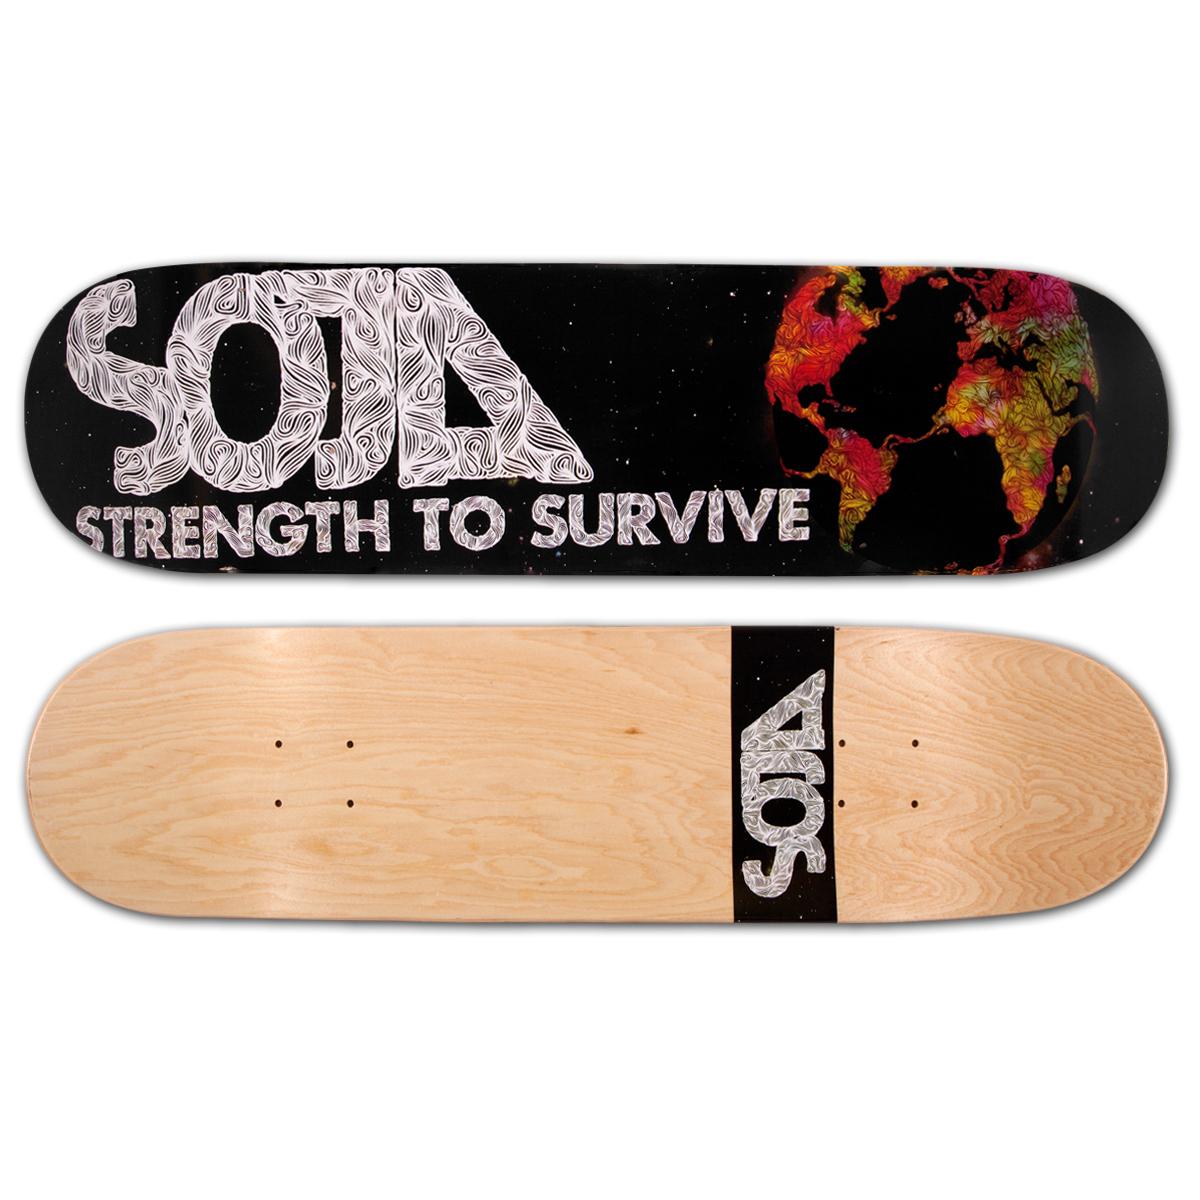 SOJA - Strength To Survive Skateboard Deck